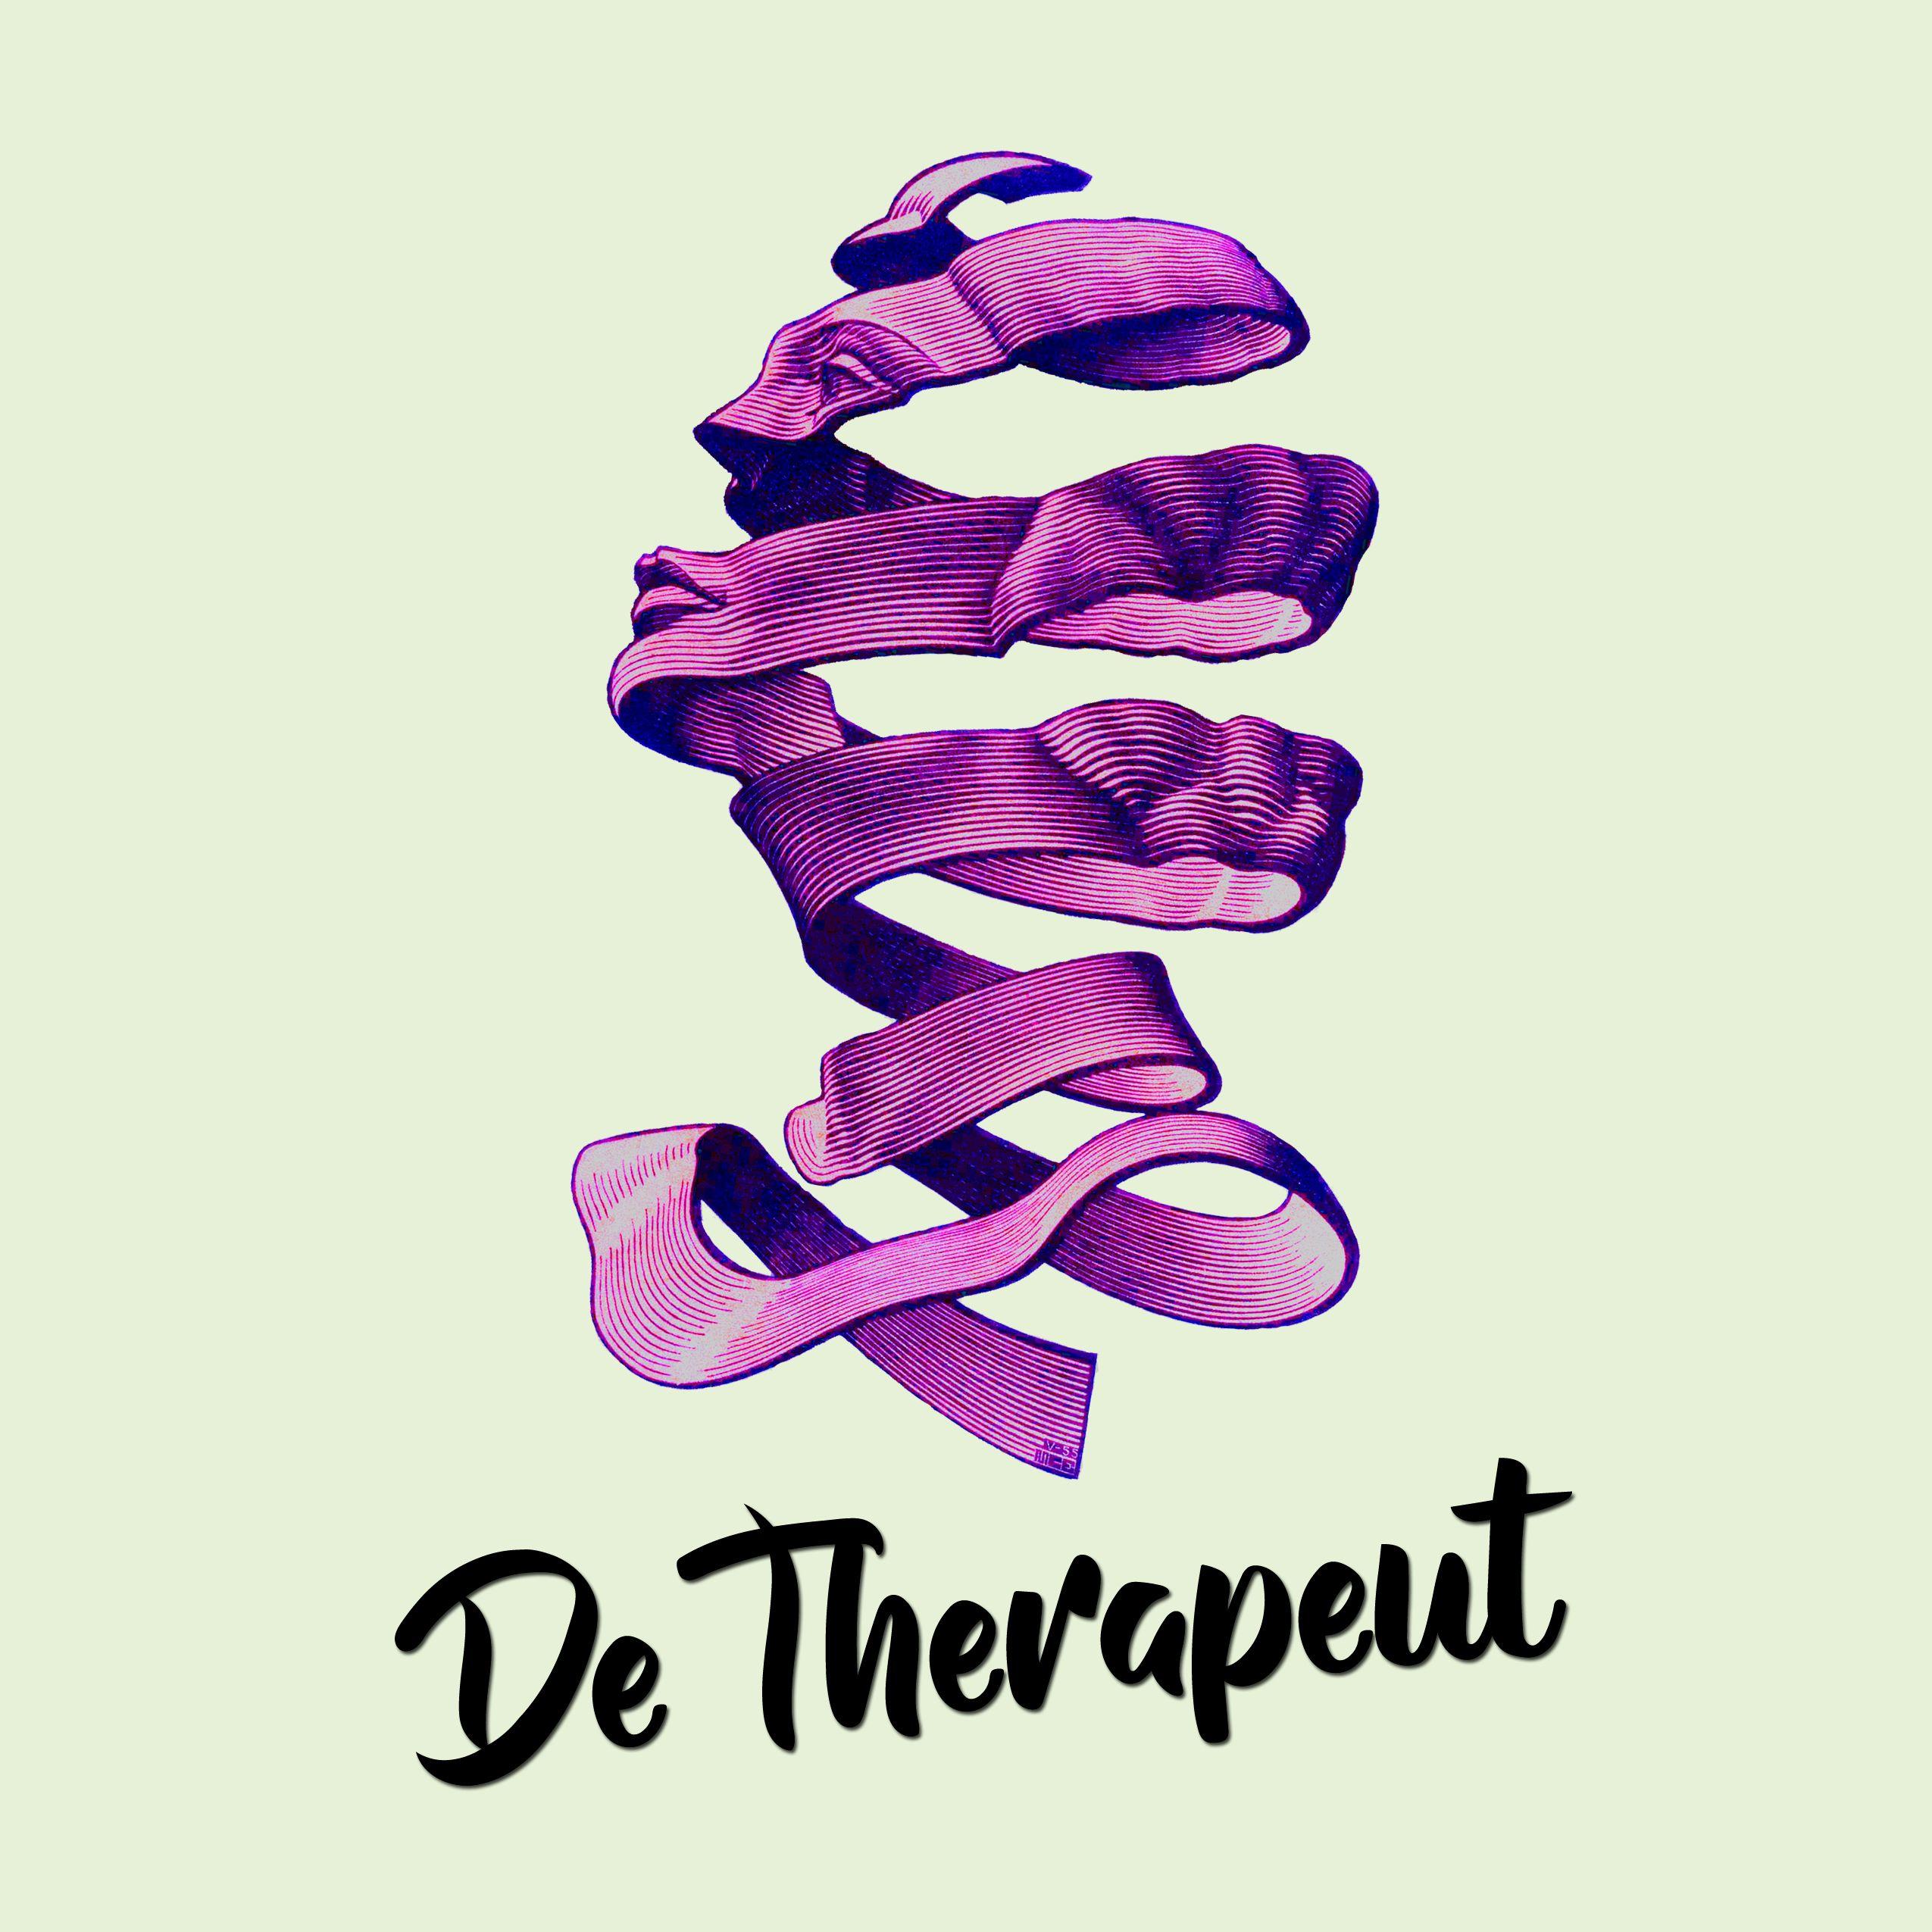 De Therapeut Podcast logo